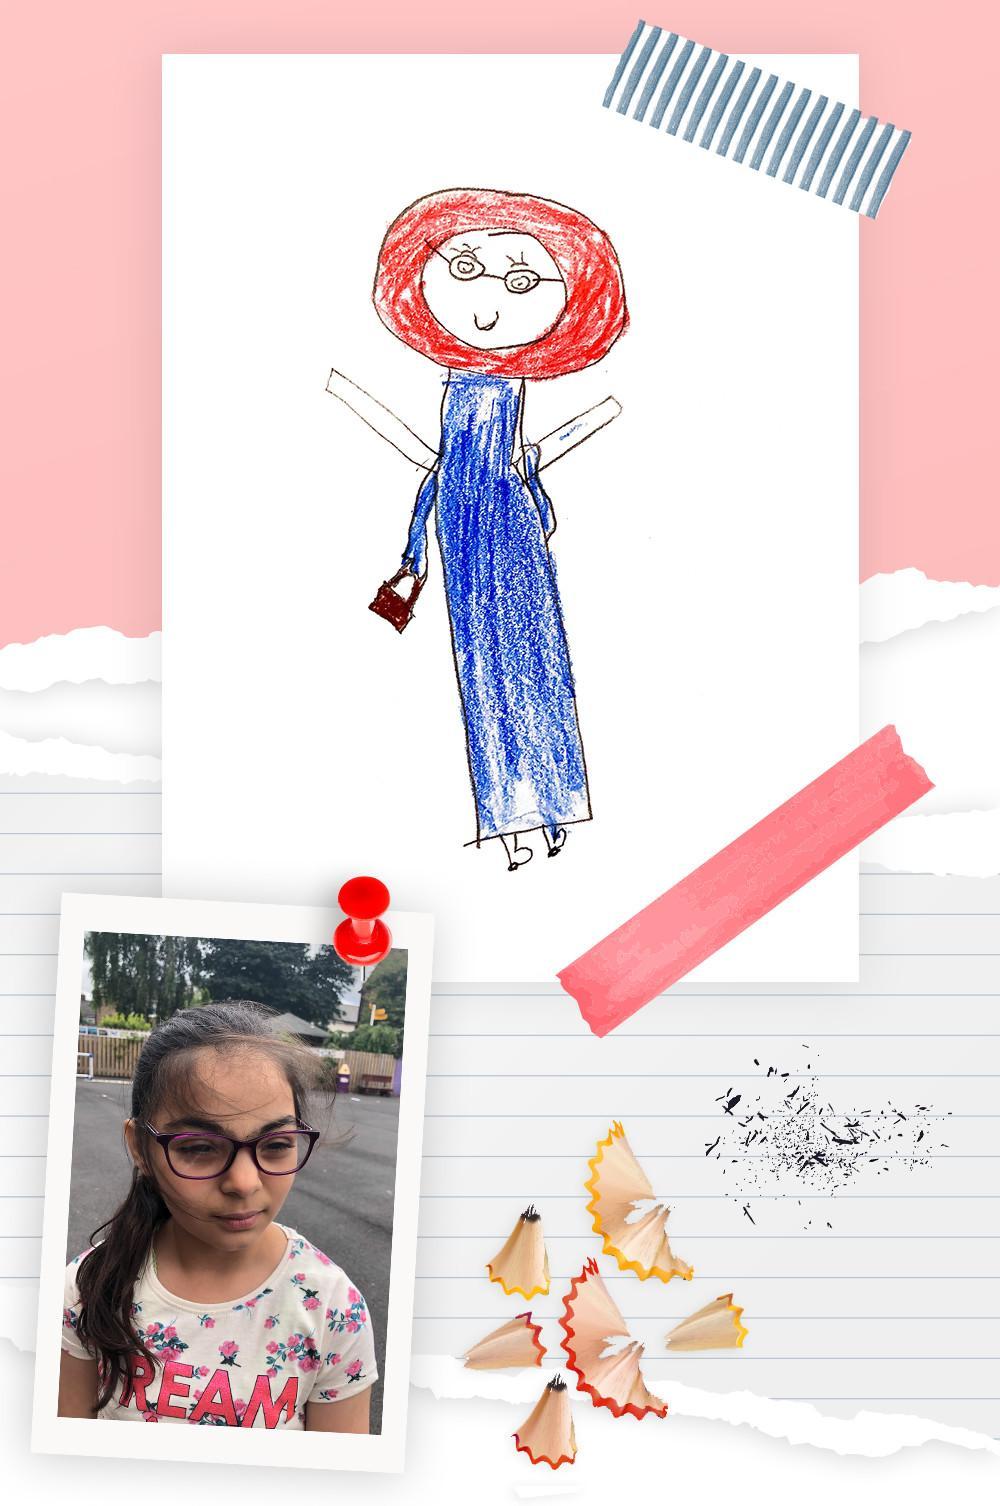 kid 2 drawing